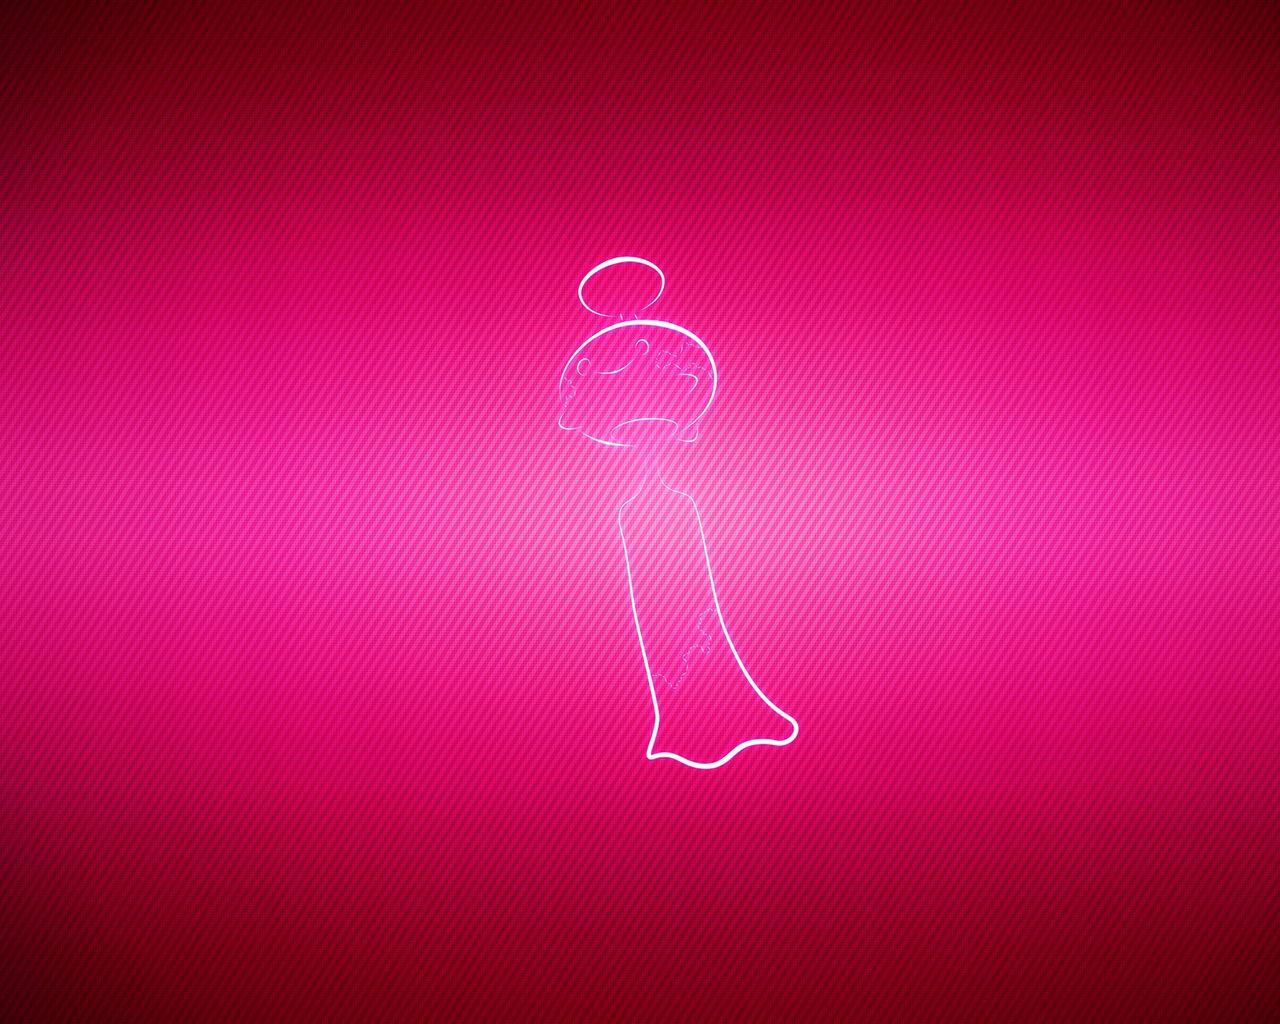 Download wallpaper 1280x1024 pokemon pink chimecho standard 54 1280x1024